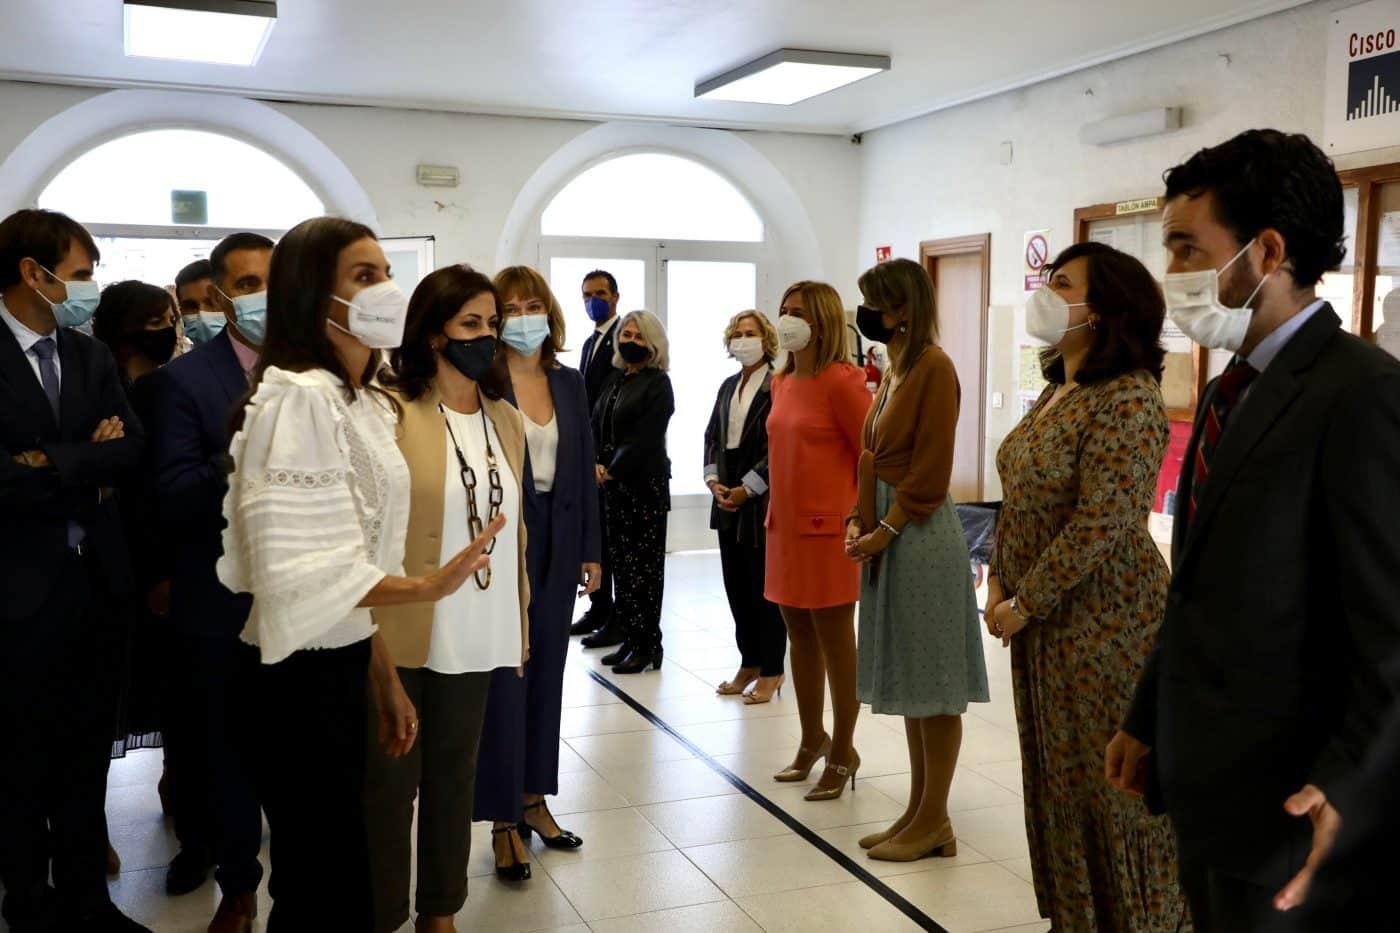 La reina Letizia preside en Haro la apertura del curso de FP 5